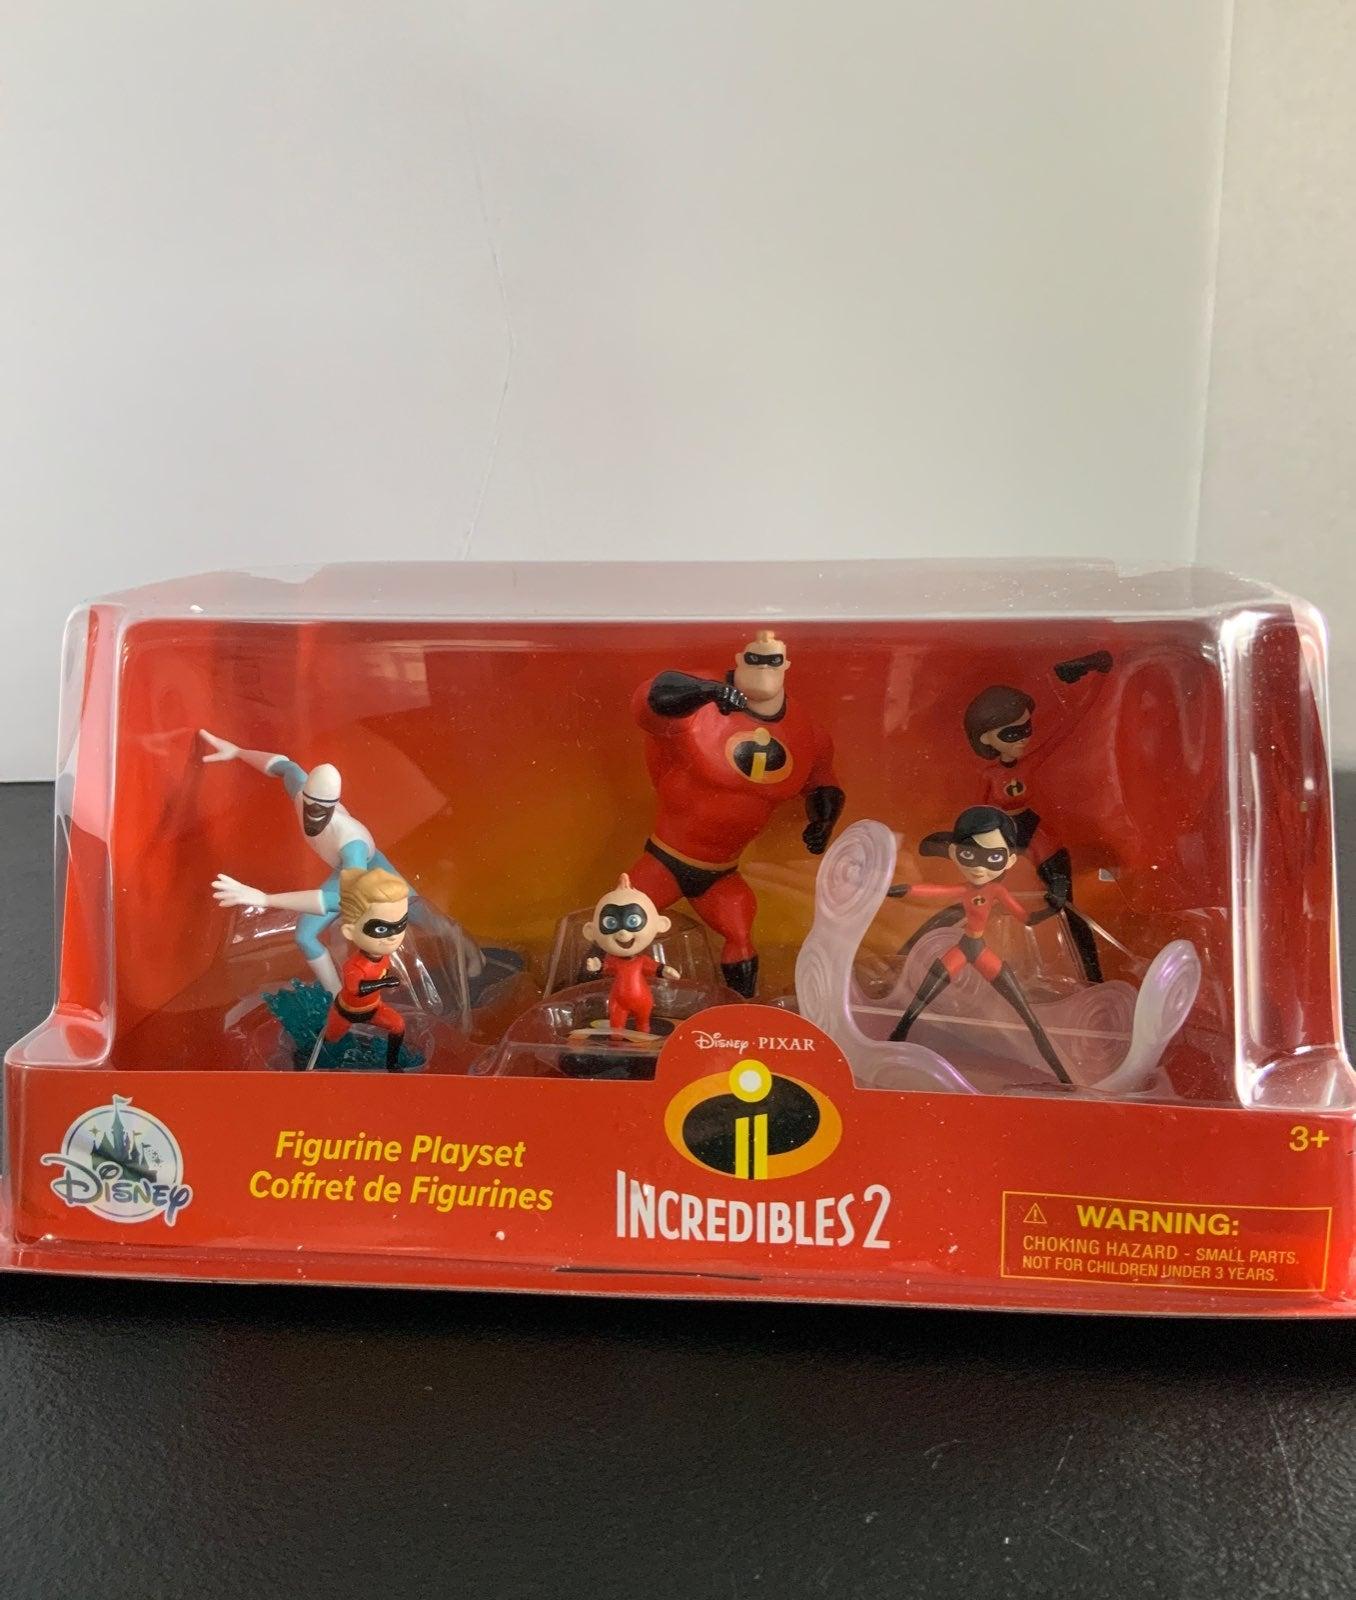 Disneys Incredibles figures